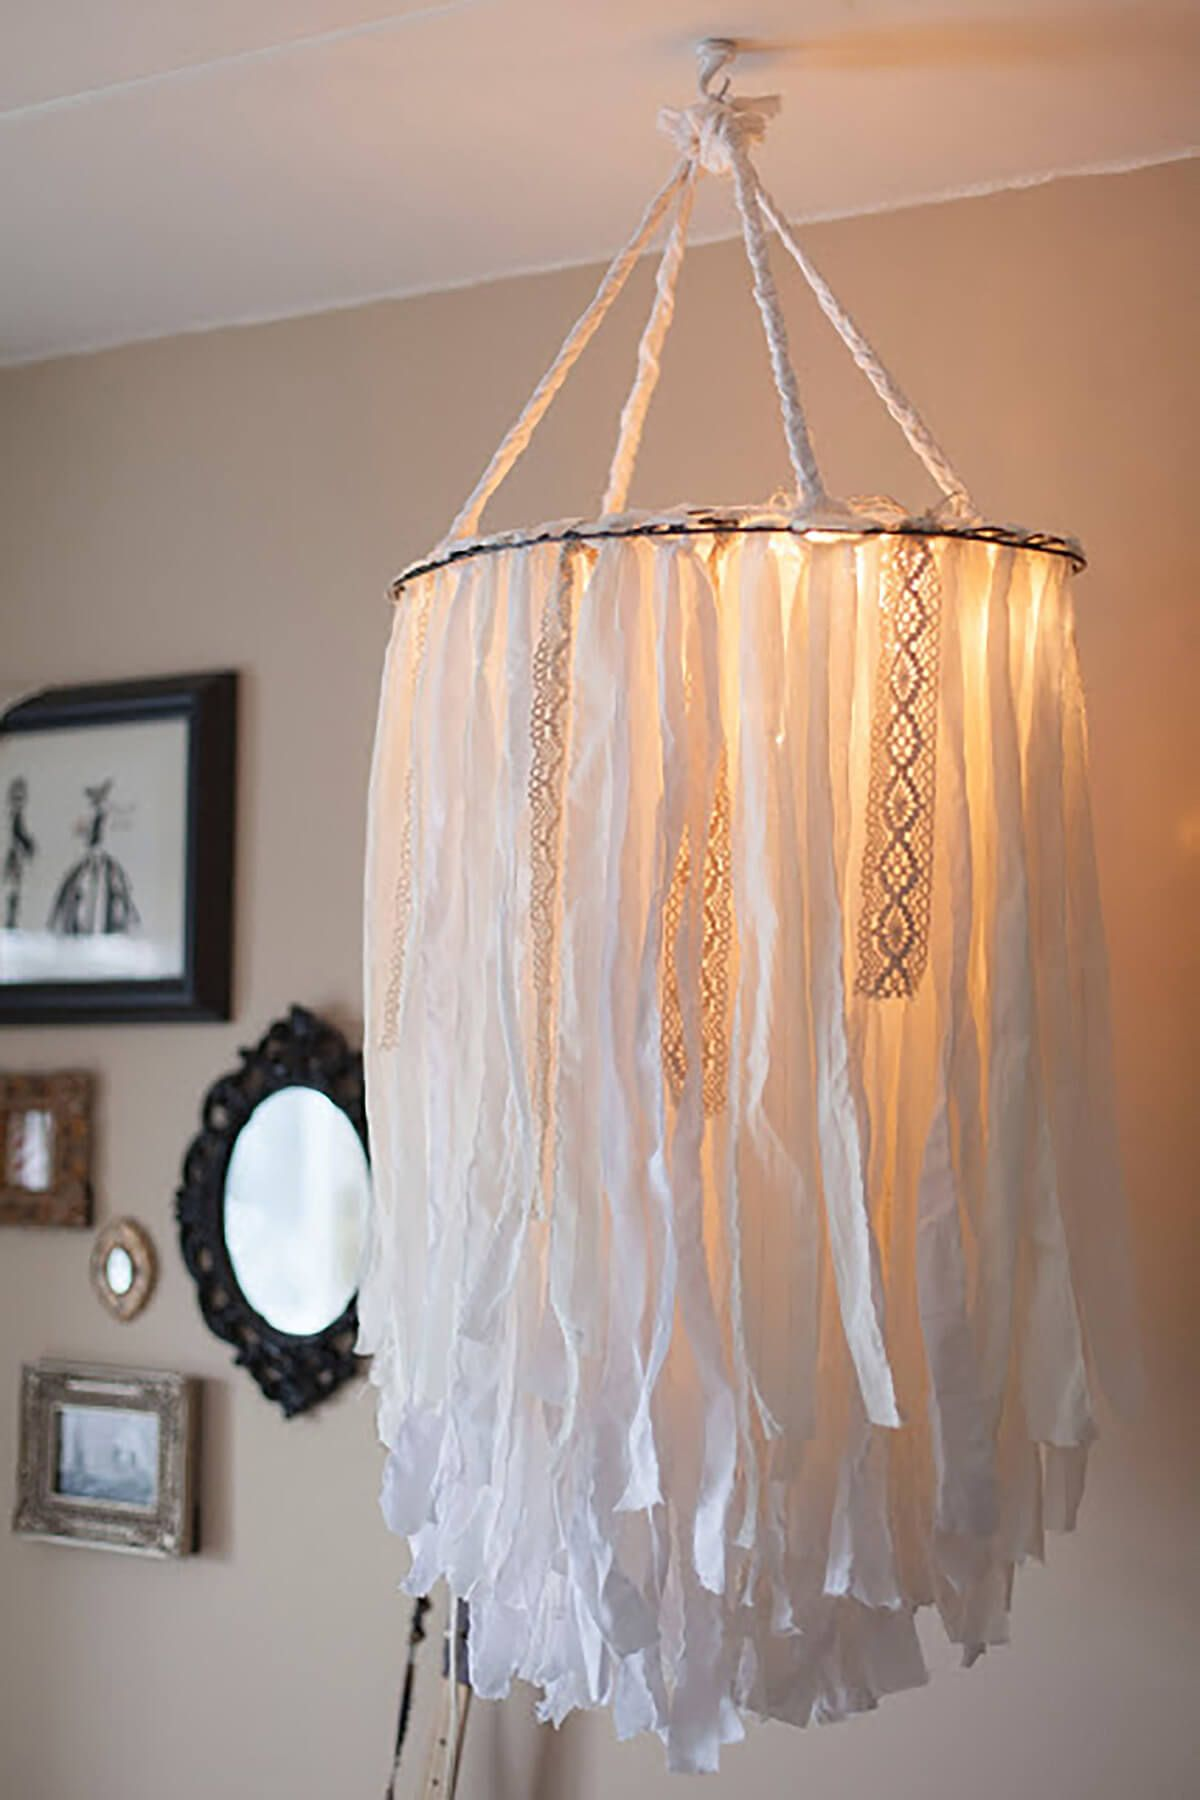 34 of the most creative diy lamps and lamp shades lampshades 34 of the most creative diy lamps and lamp shades arubaitofo Images